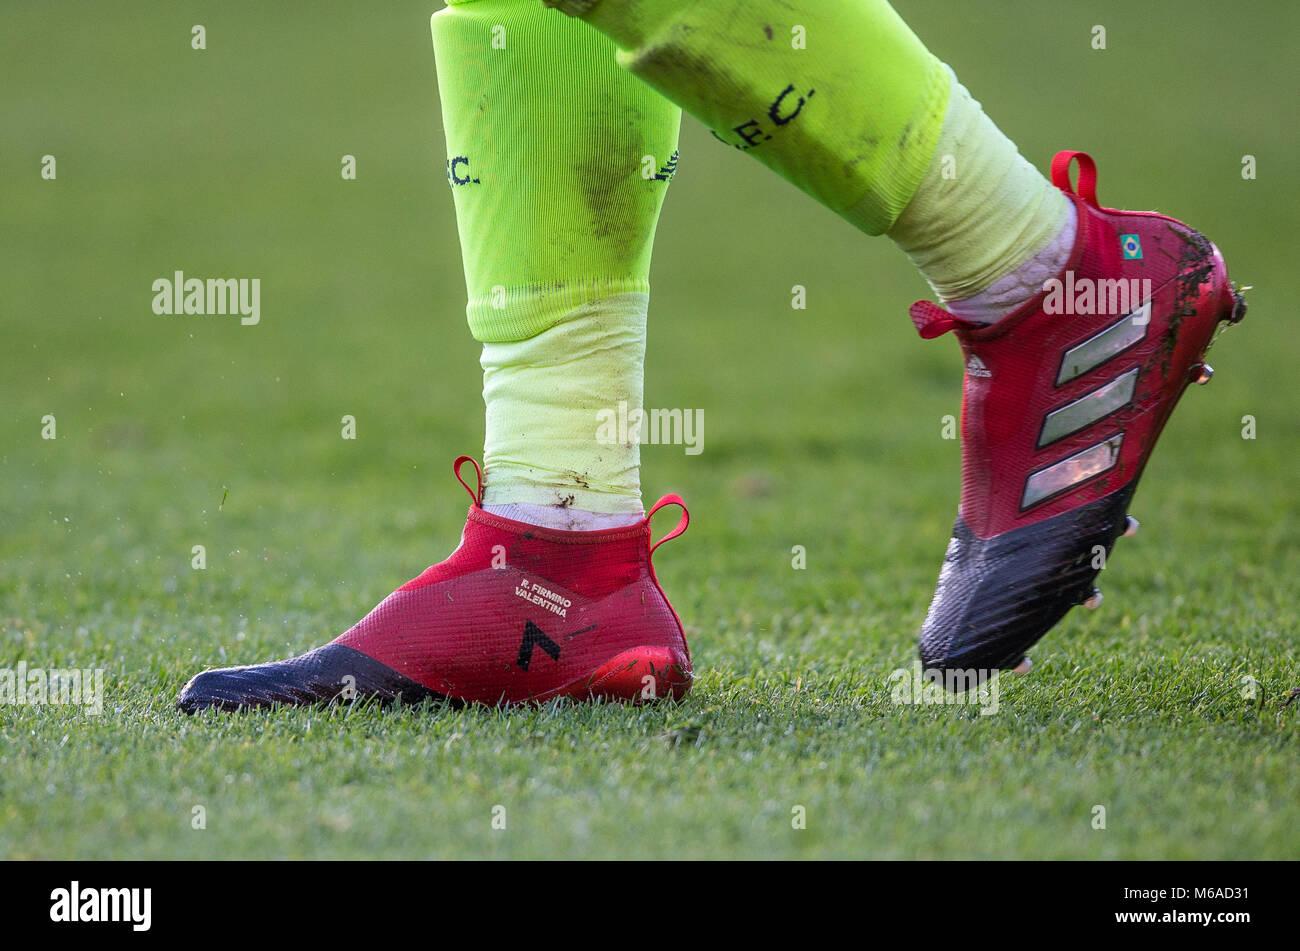 Chaussures Roberto Firmino Foot Et De LiverpoolChaussettes K1FcTlJ3